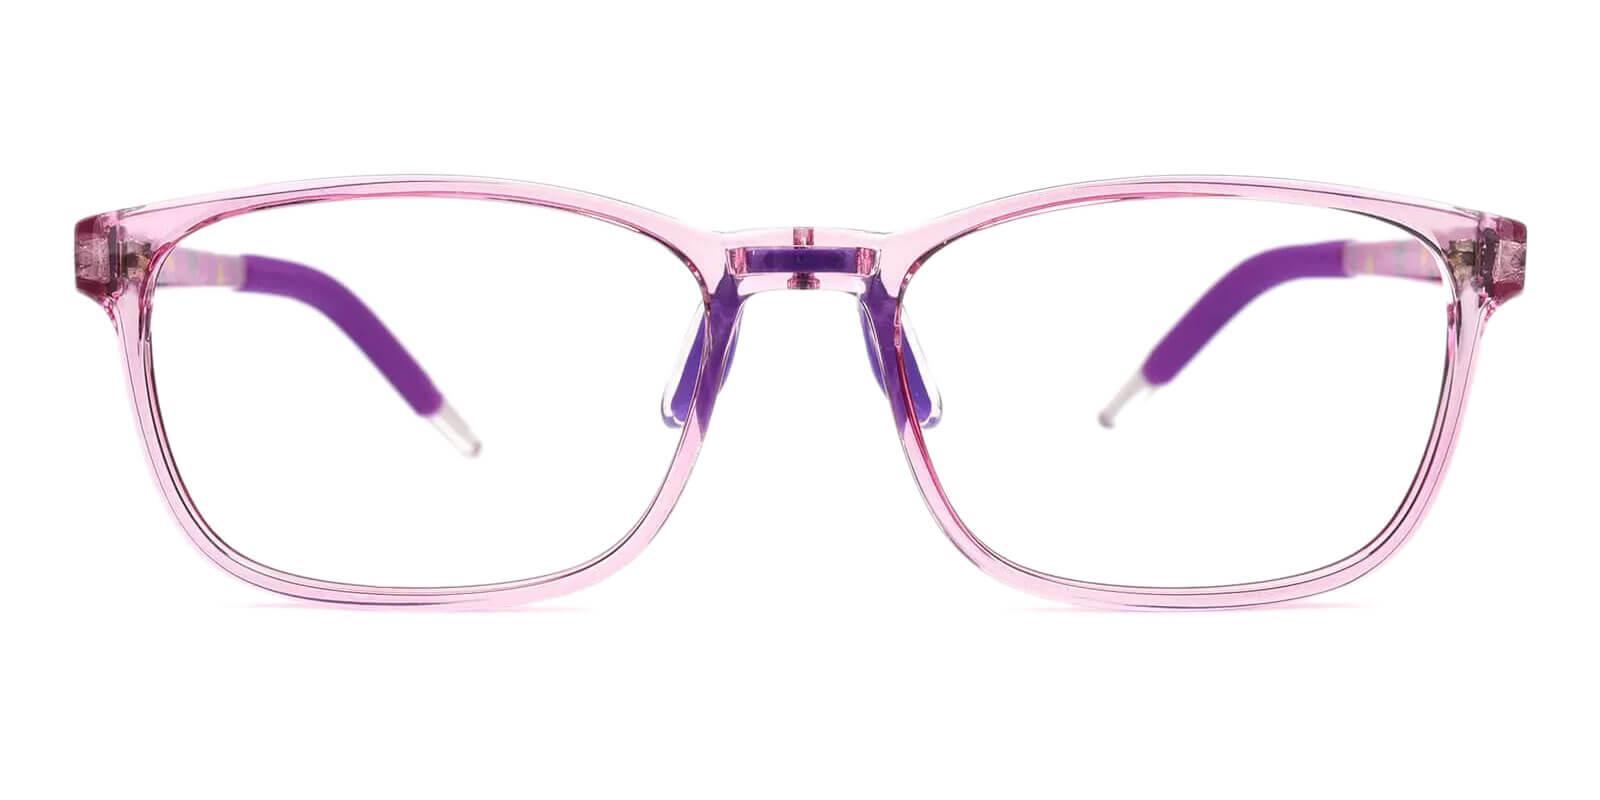 Sparkle Purple Acetate , TR Eyeglasses , Lightweight , NosePads , UniversalBridgeFit Frames from ABBE Glasses